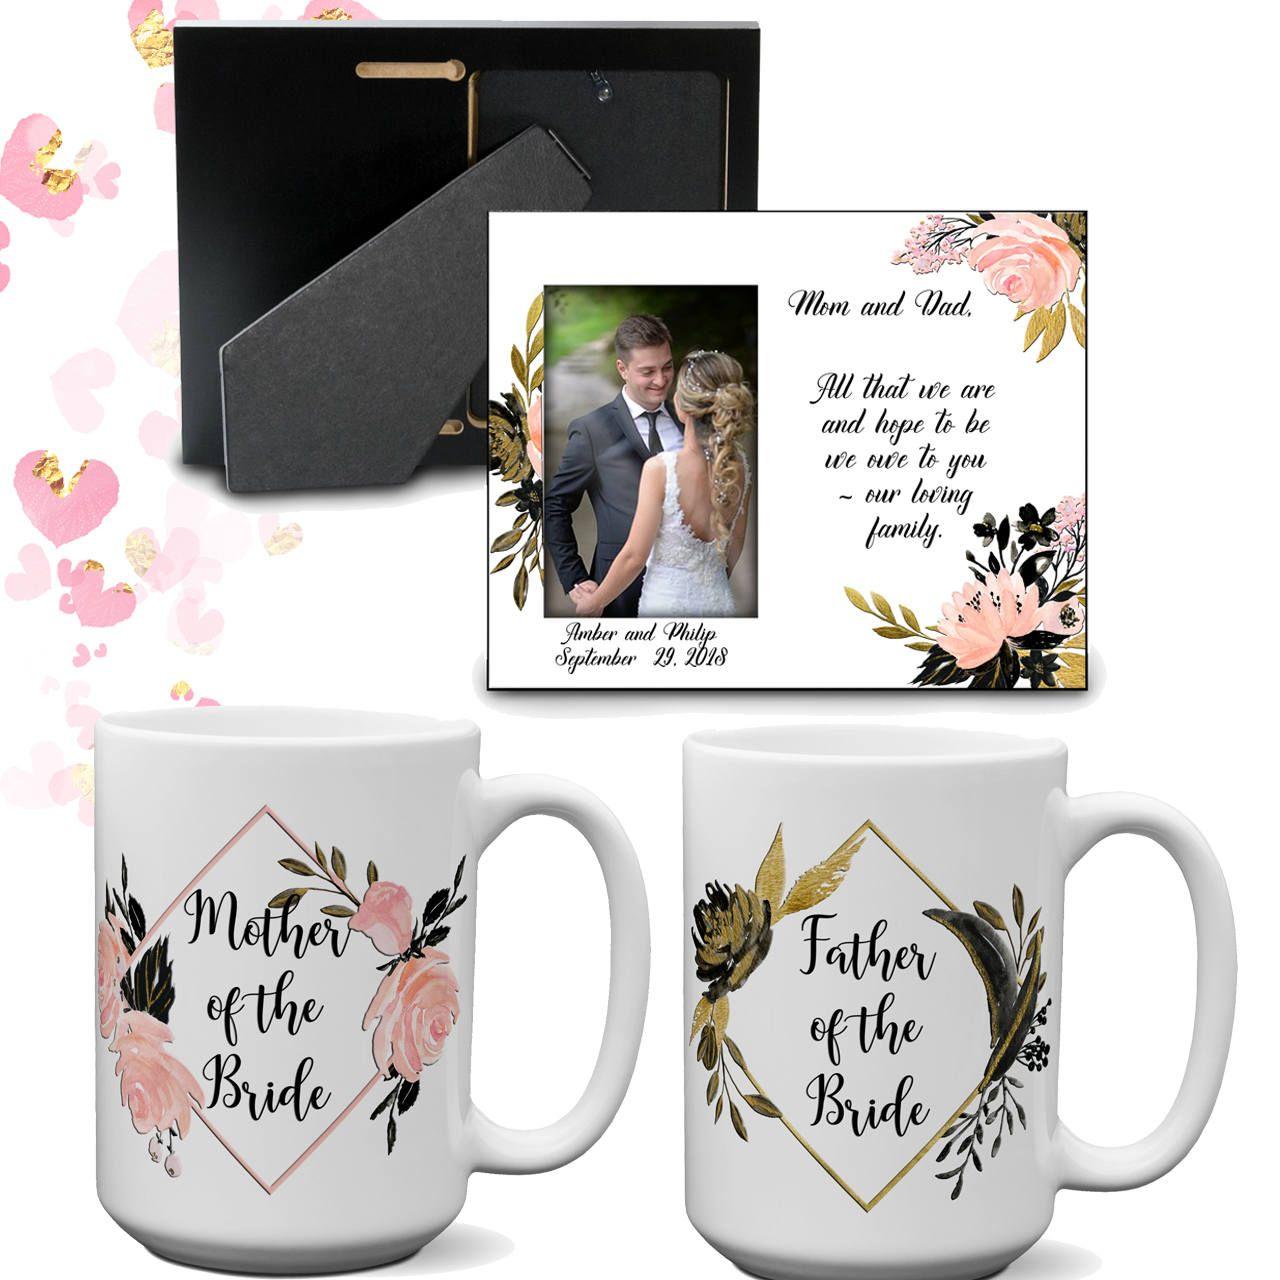 c02ab171847 Parent Wedding Gift Thank You Set | Wedding Frame | Mother of the Bride  Groom Mug | Father of the Bride Groom Cup | Parent Gift Box by JuliesHeart  on Etsy